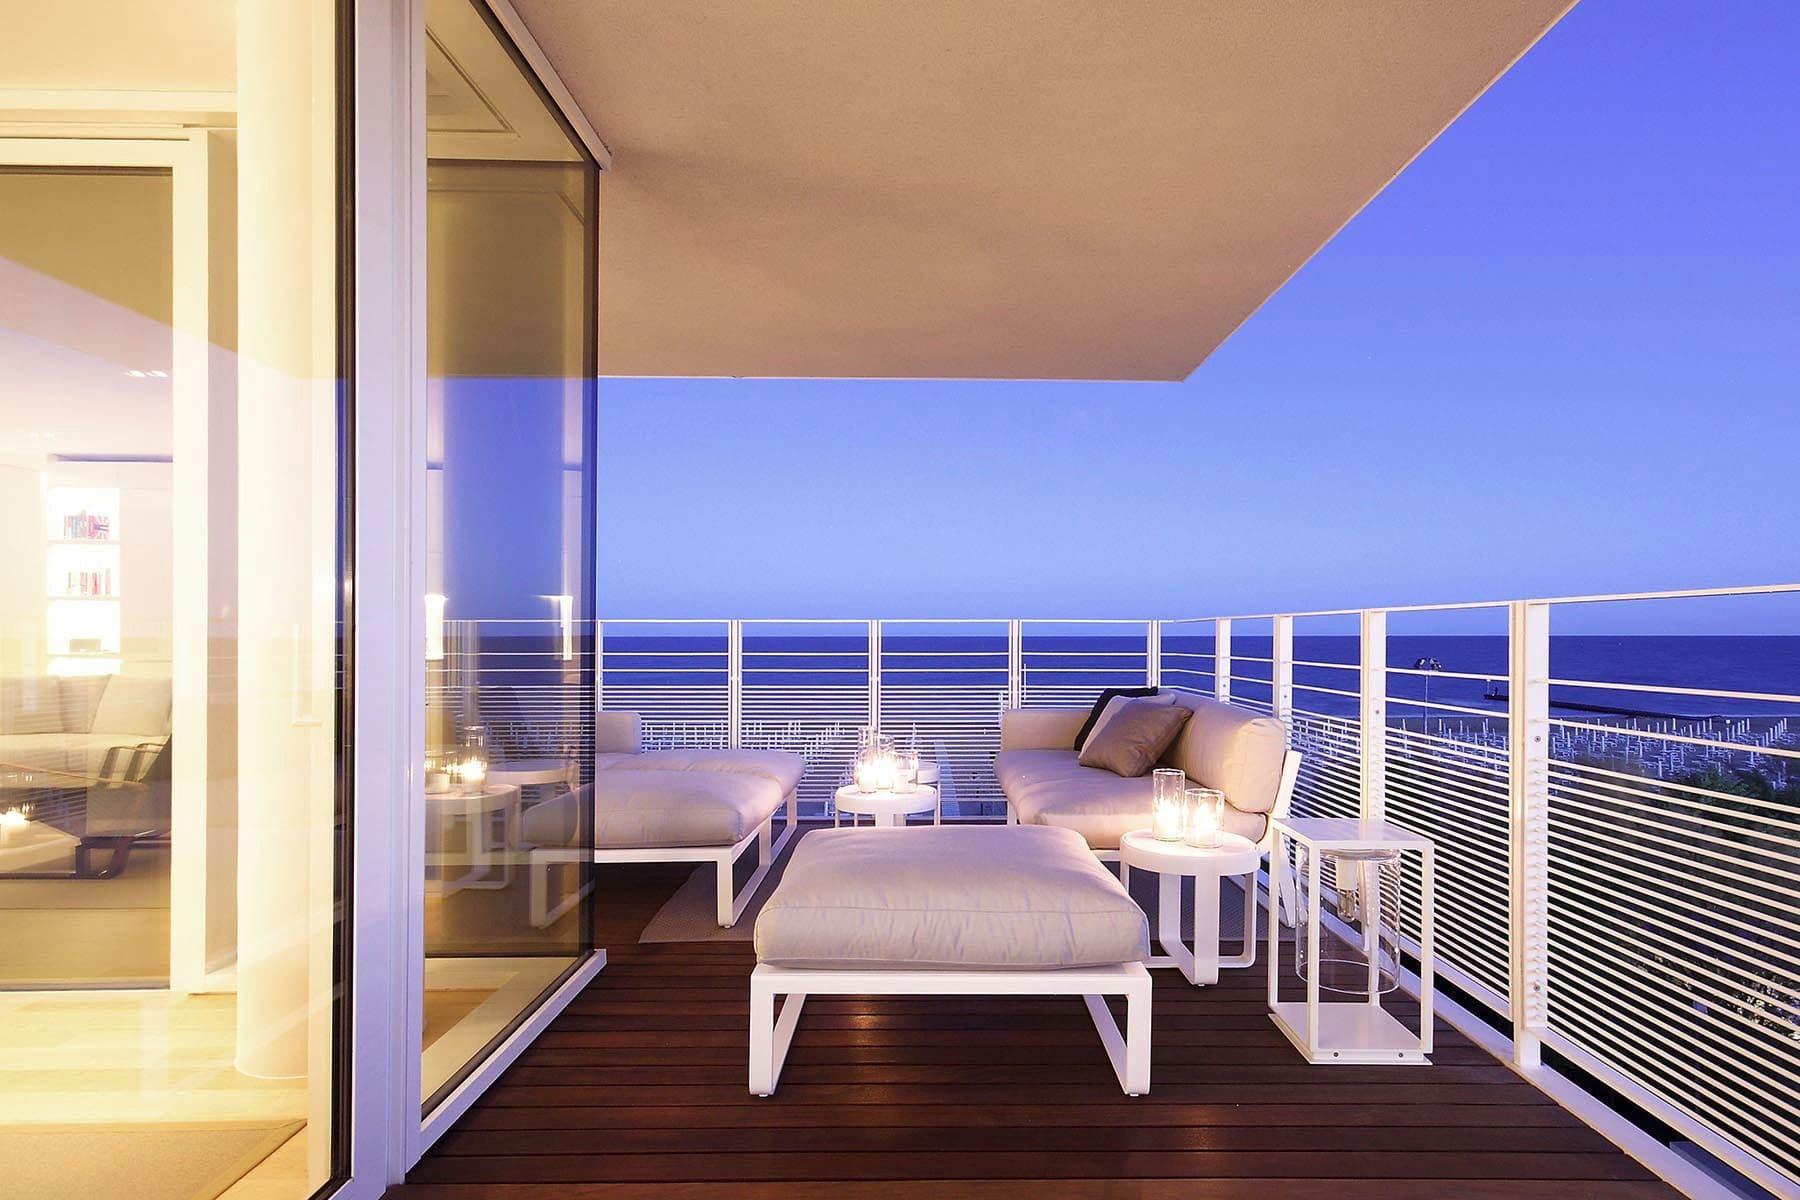 Plano departamento peque o dos dormitorios construye hogar for Terrazas para departamentos